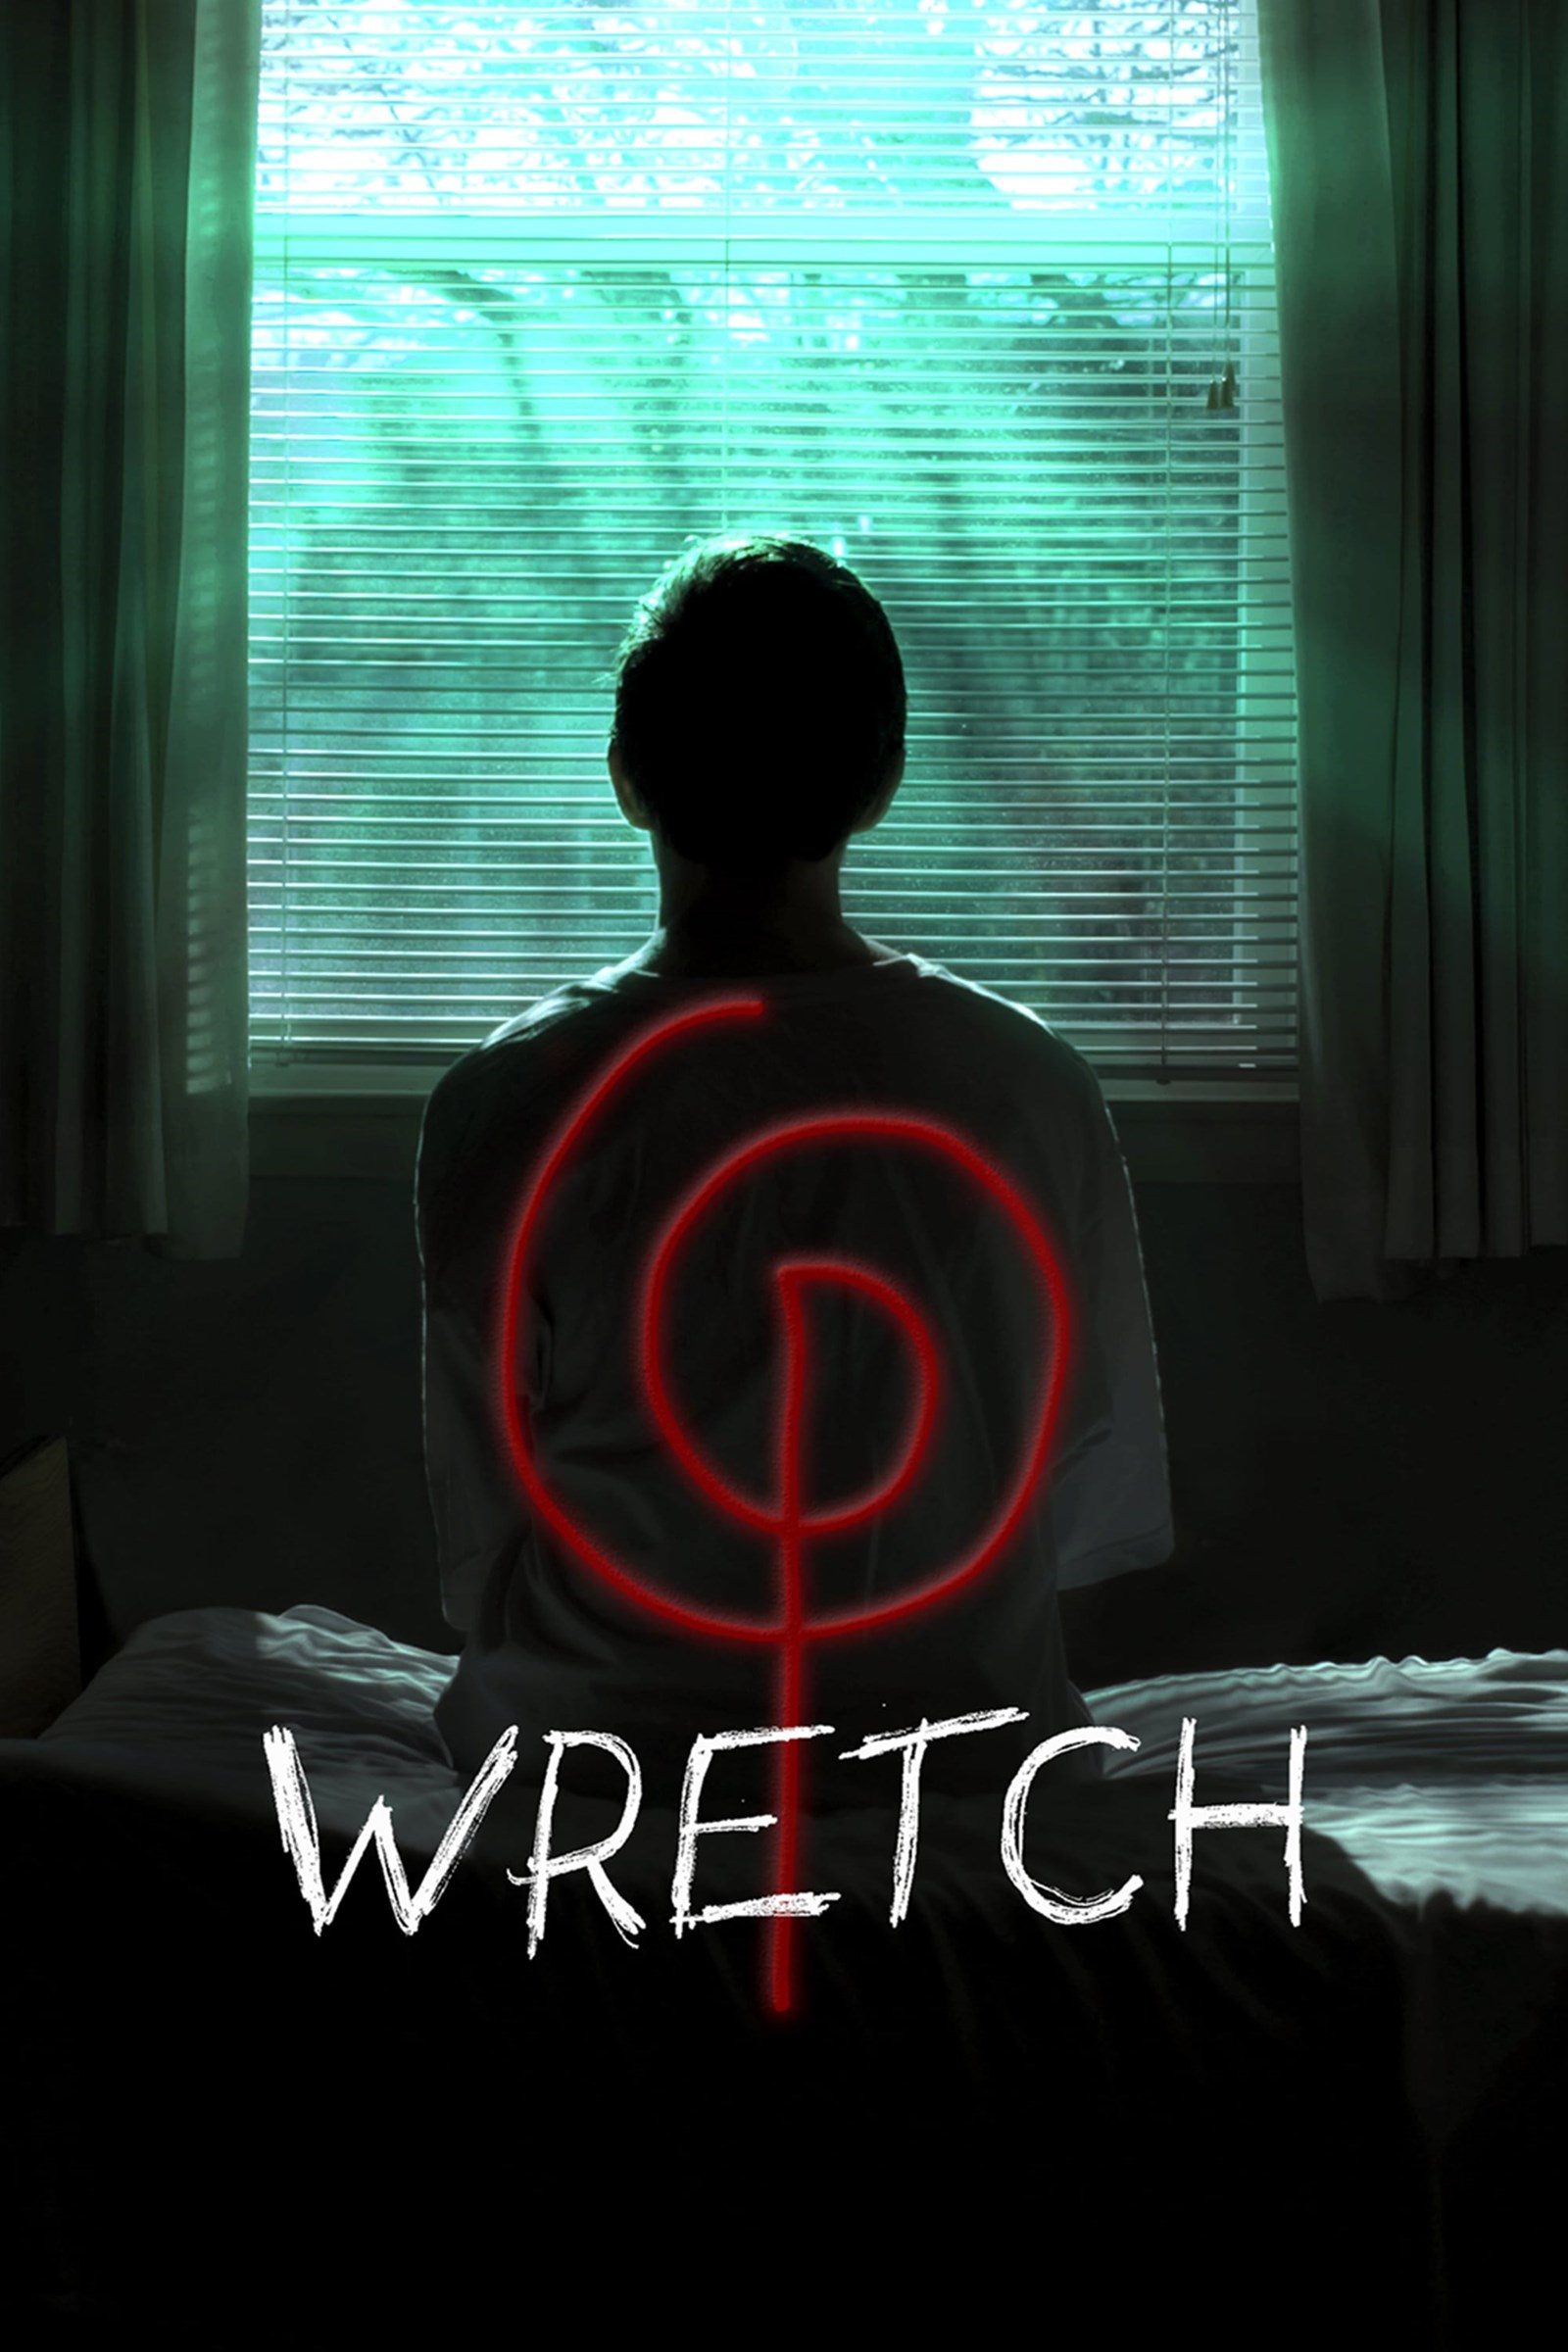 Subscene - Subtitles for Wretch